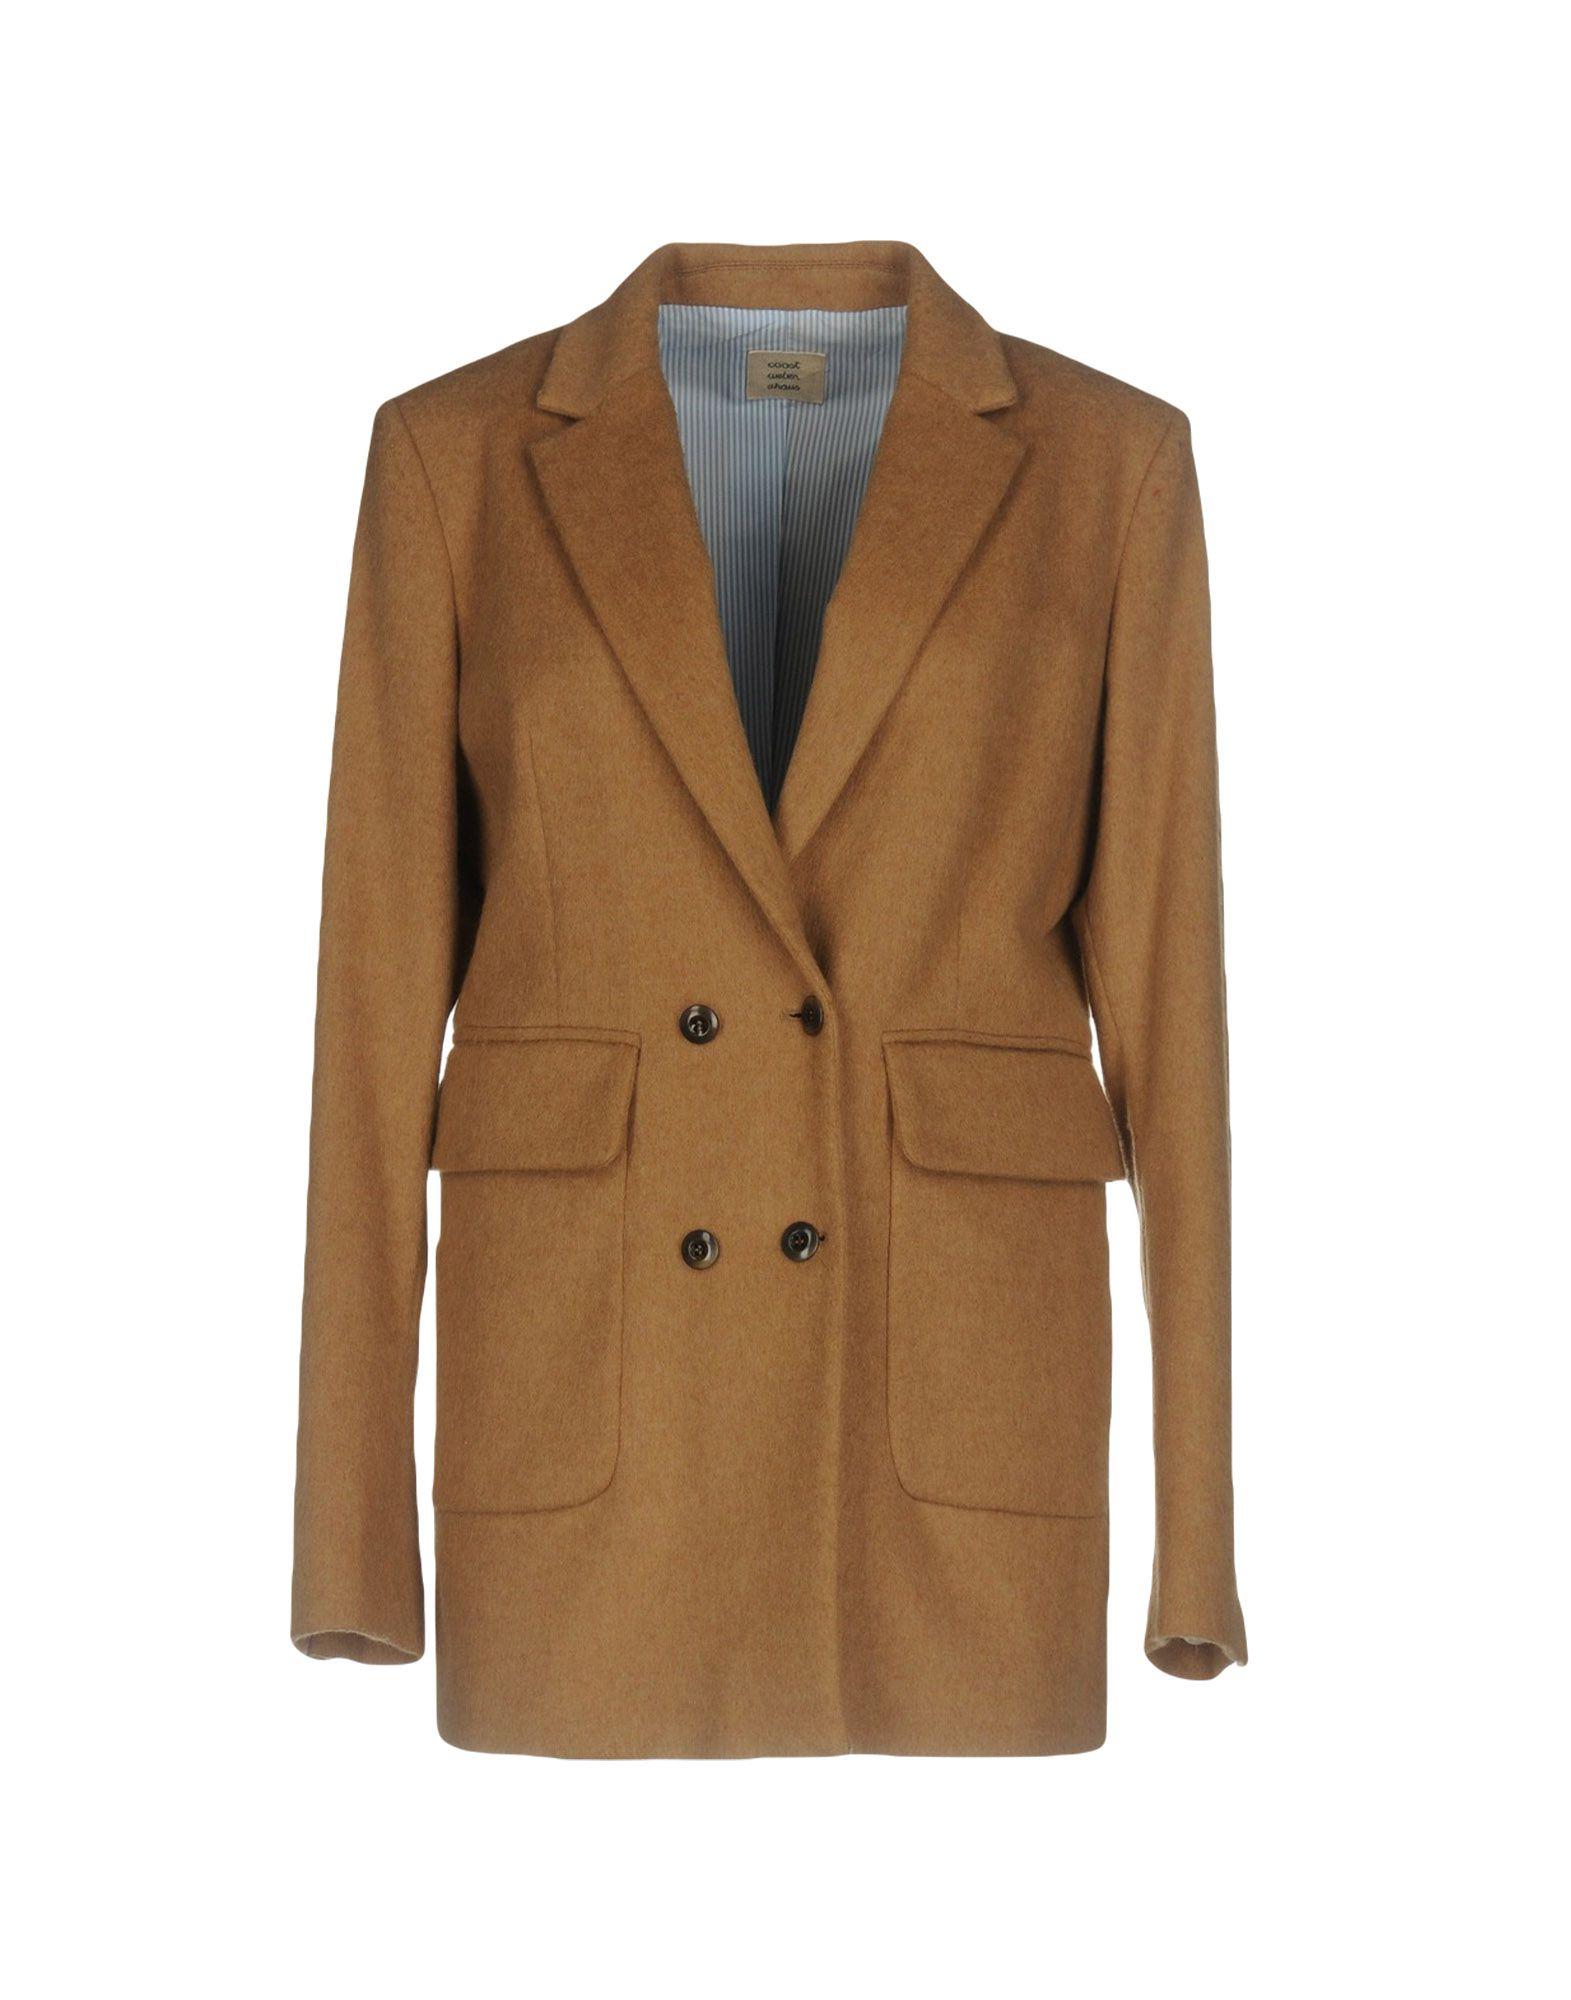 COAST WEBER & AHAUS Damen Jackett Farbe Kamel Größe 6